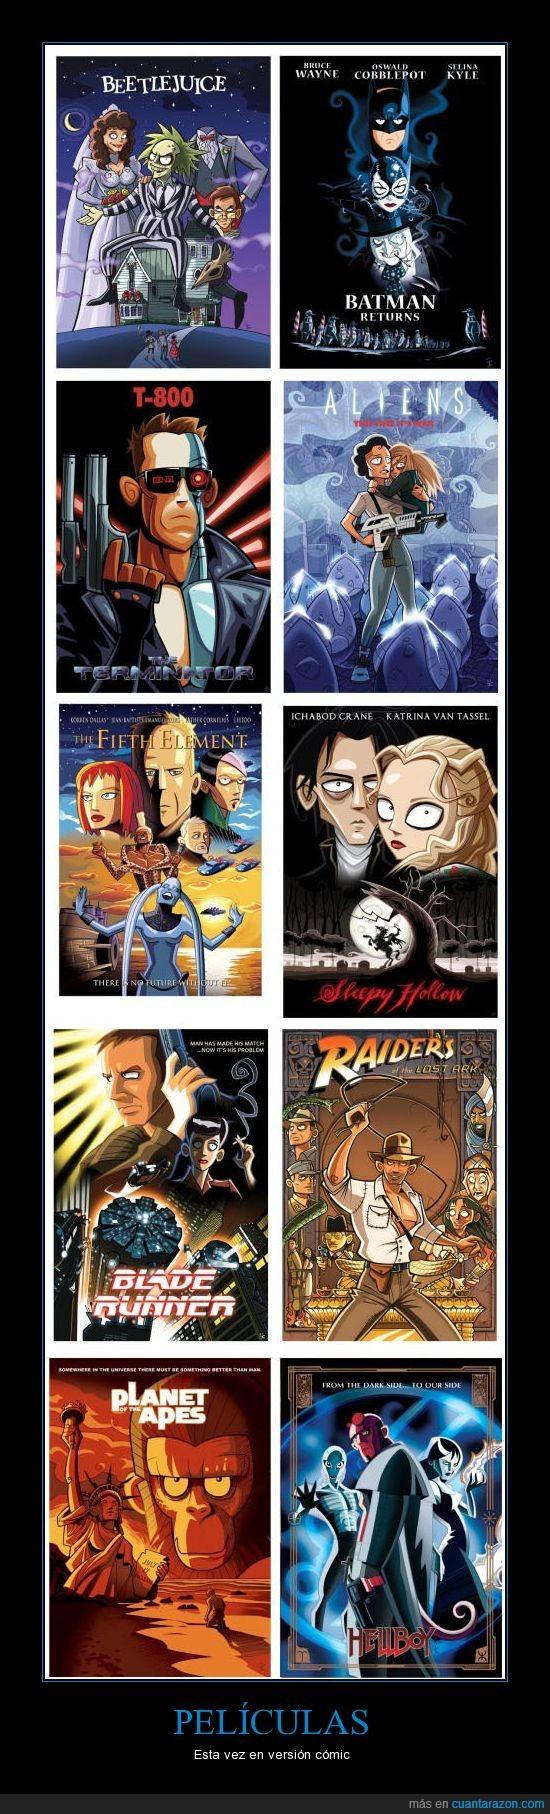 aliens,blade runner,Hellboy,planeta,Simios,terminator